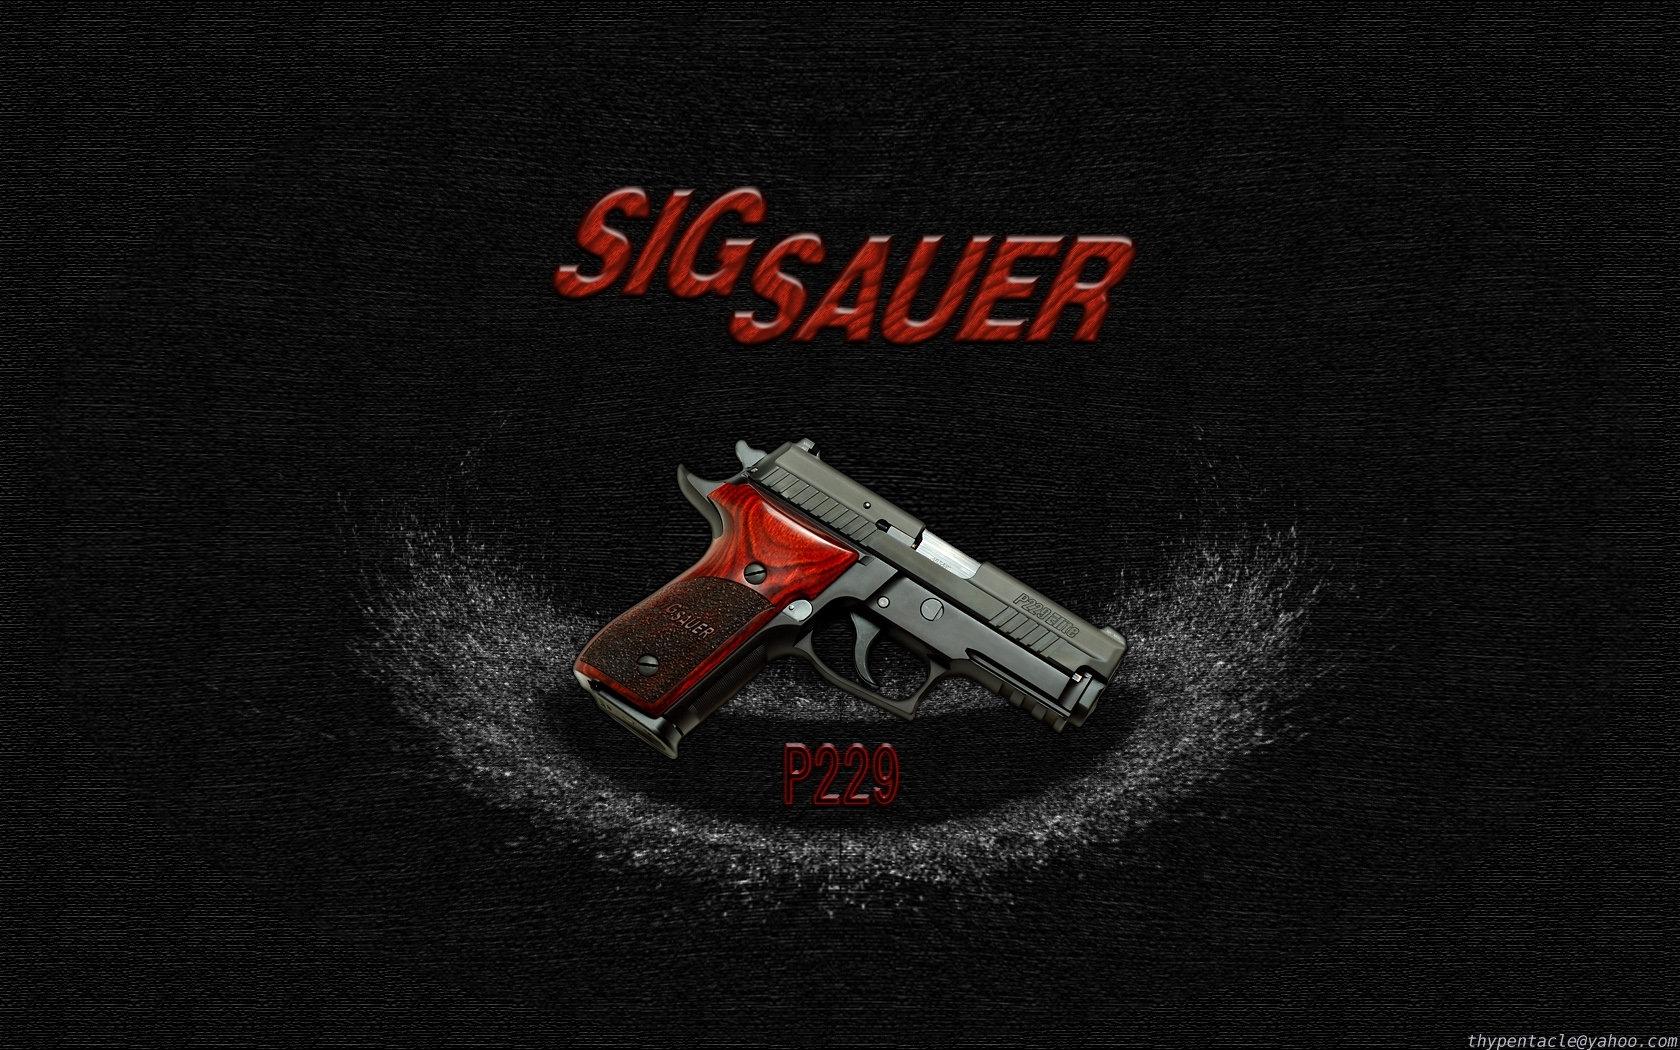 sig sauer p229 elite - widethypentacle on deviantart